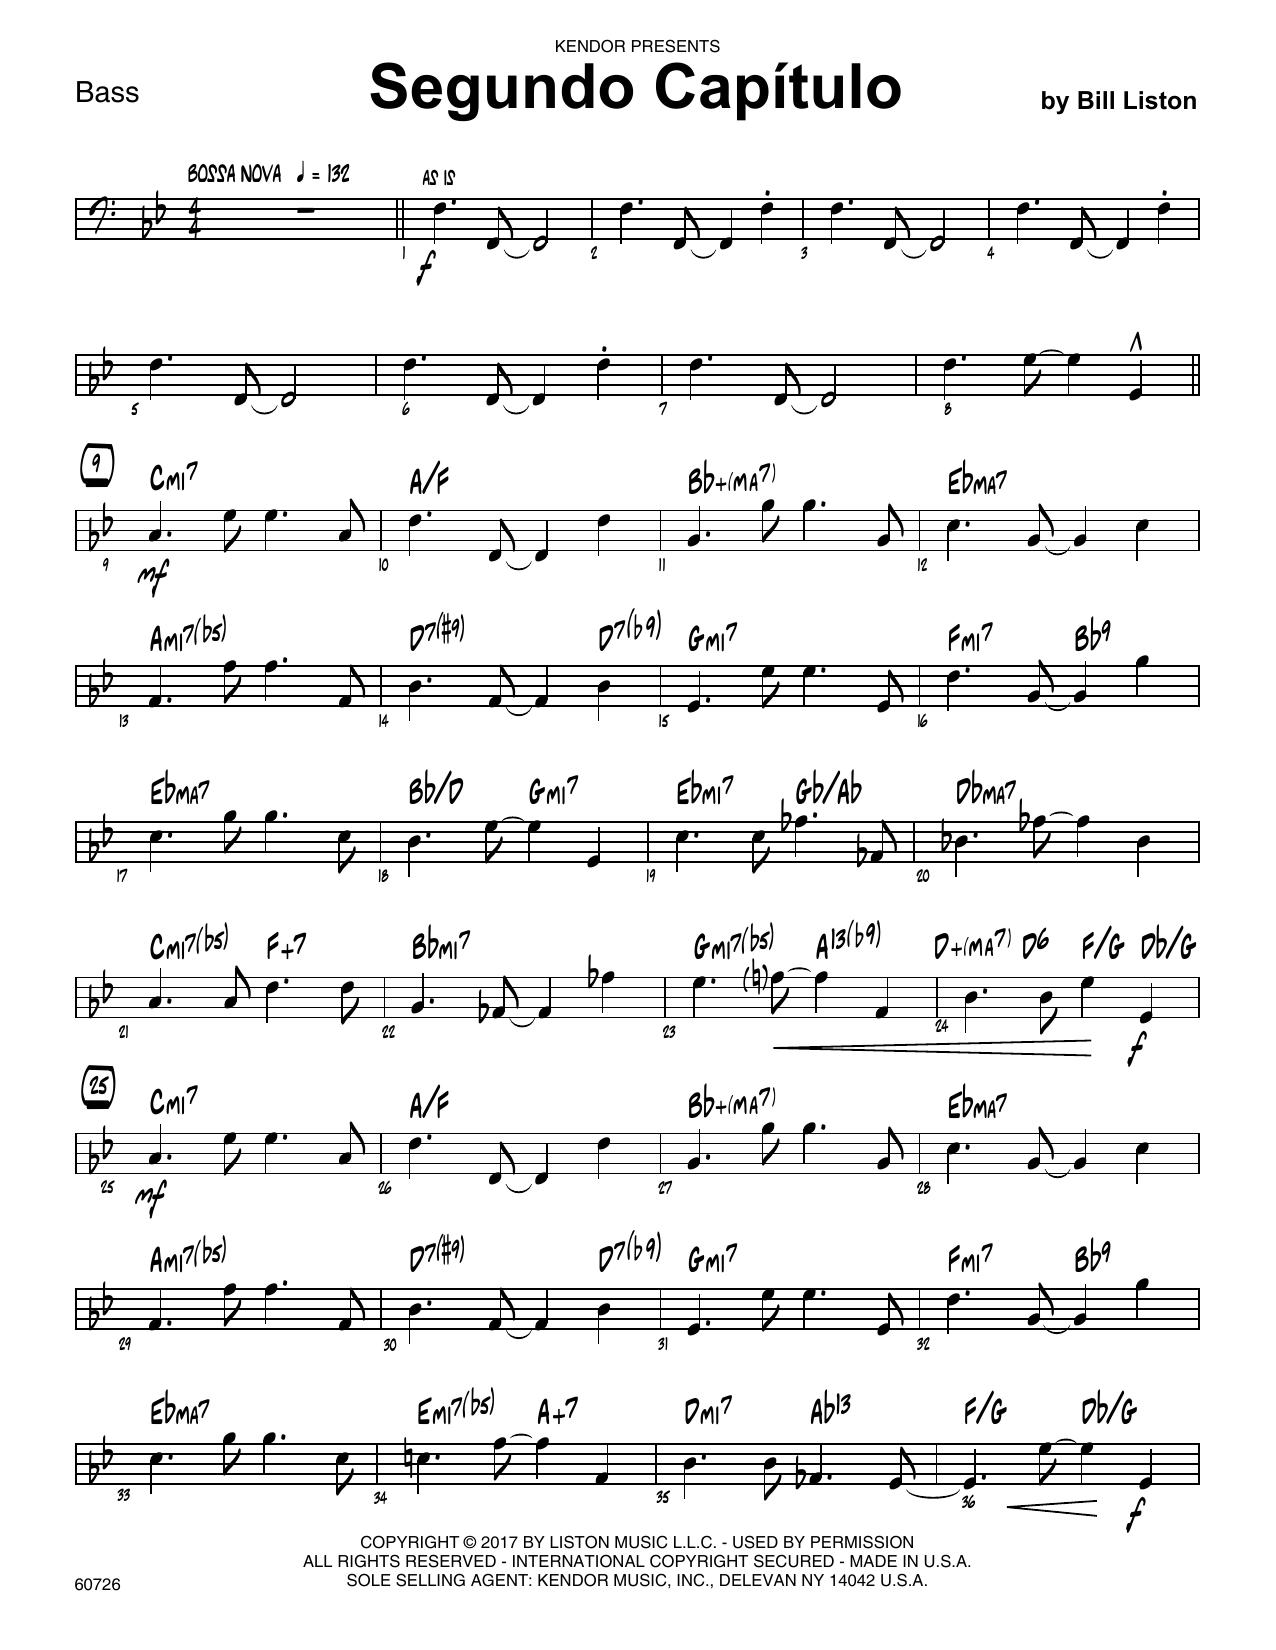 Bill Liston Segundo Capitulo - Bass sheet music notes printable PDF score